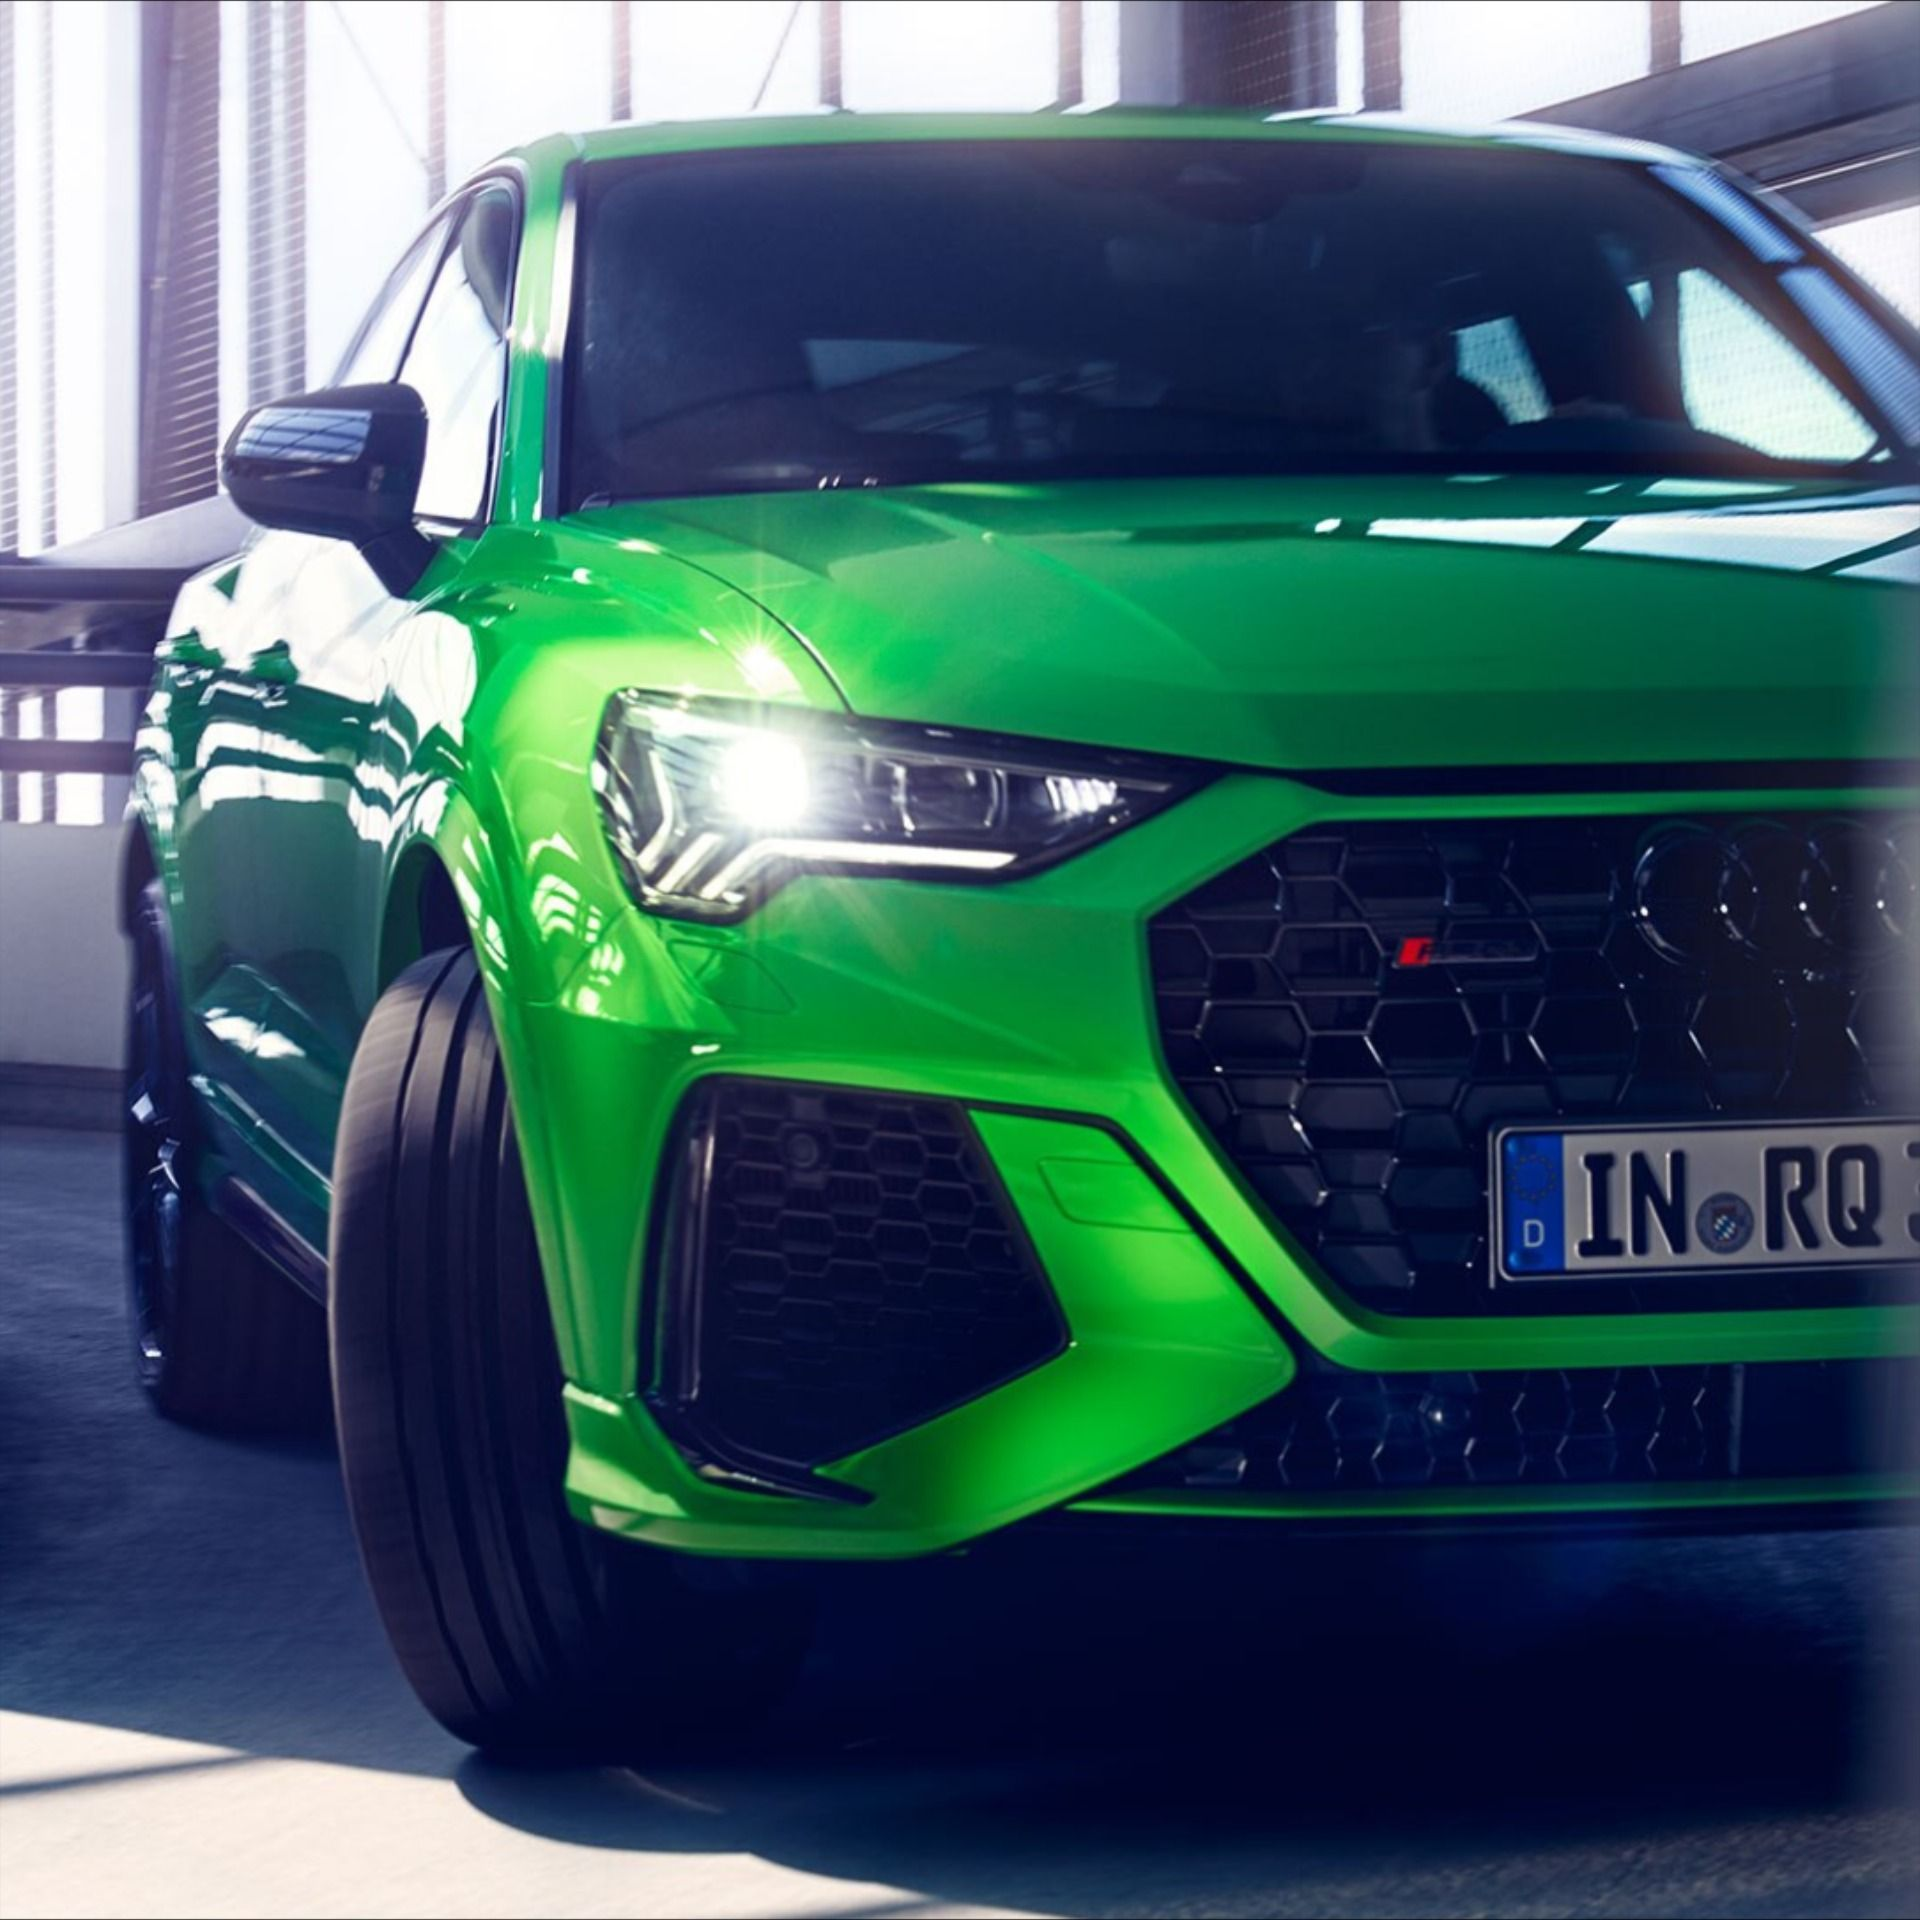 Pin De Anna En Audi En 2020